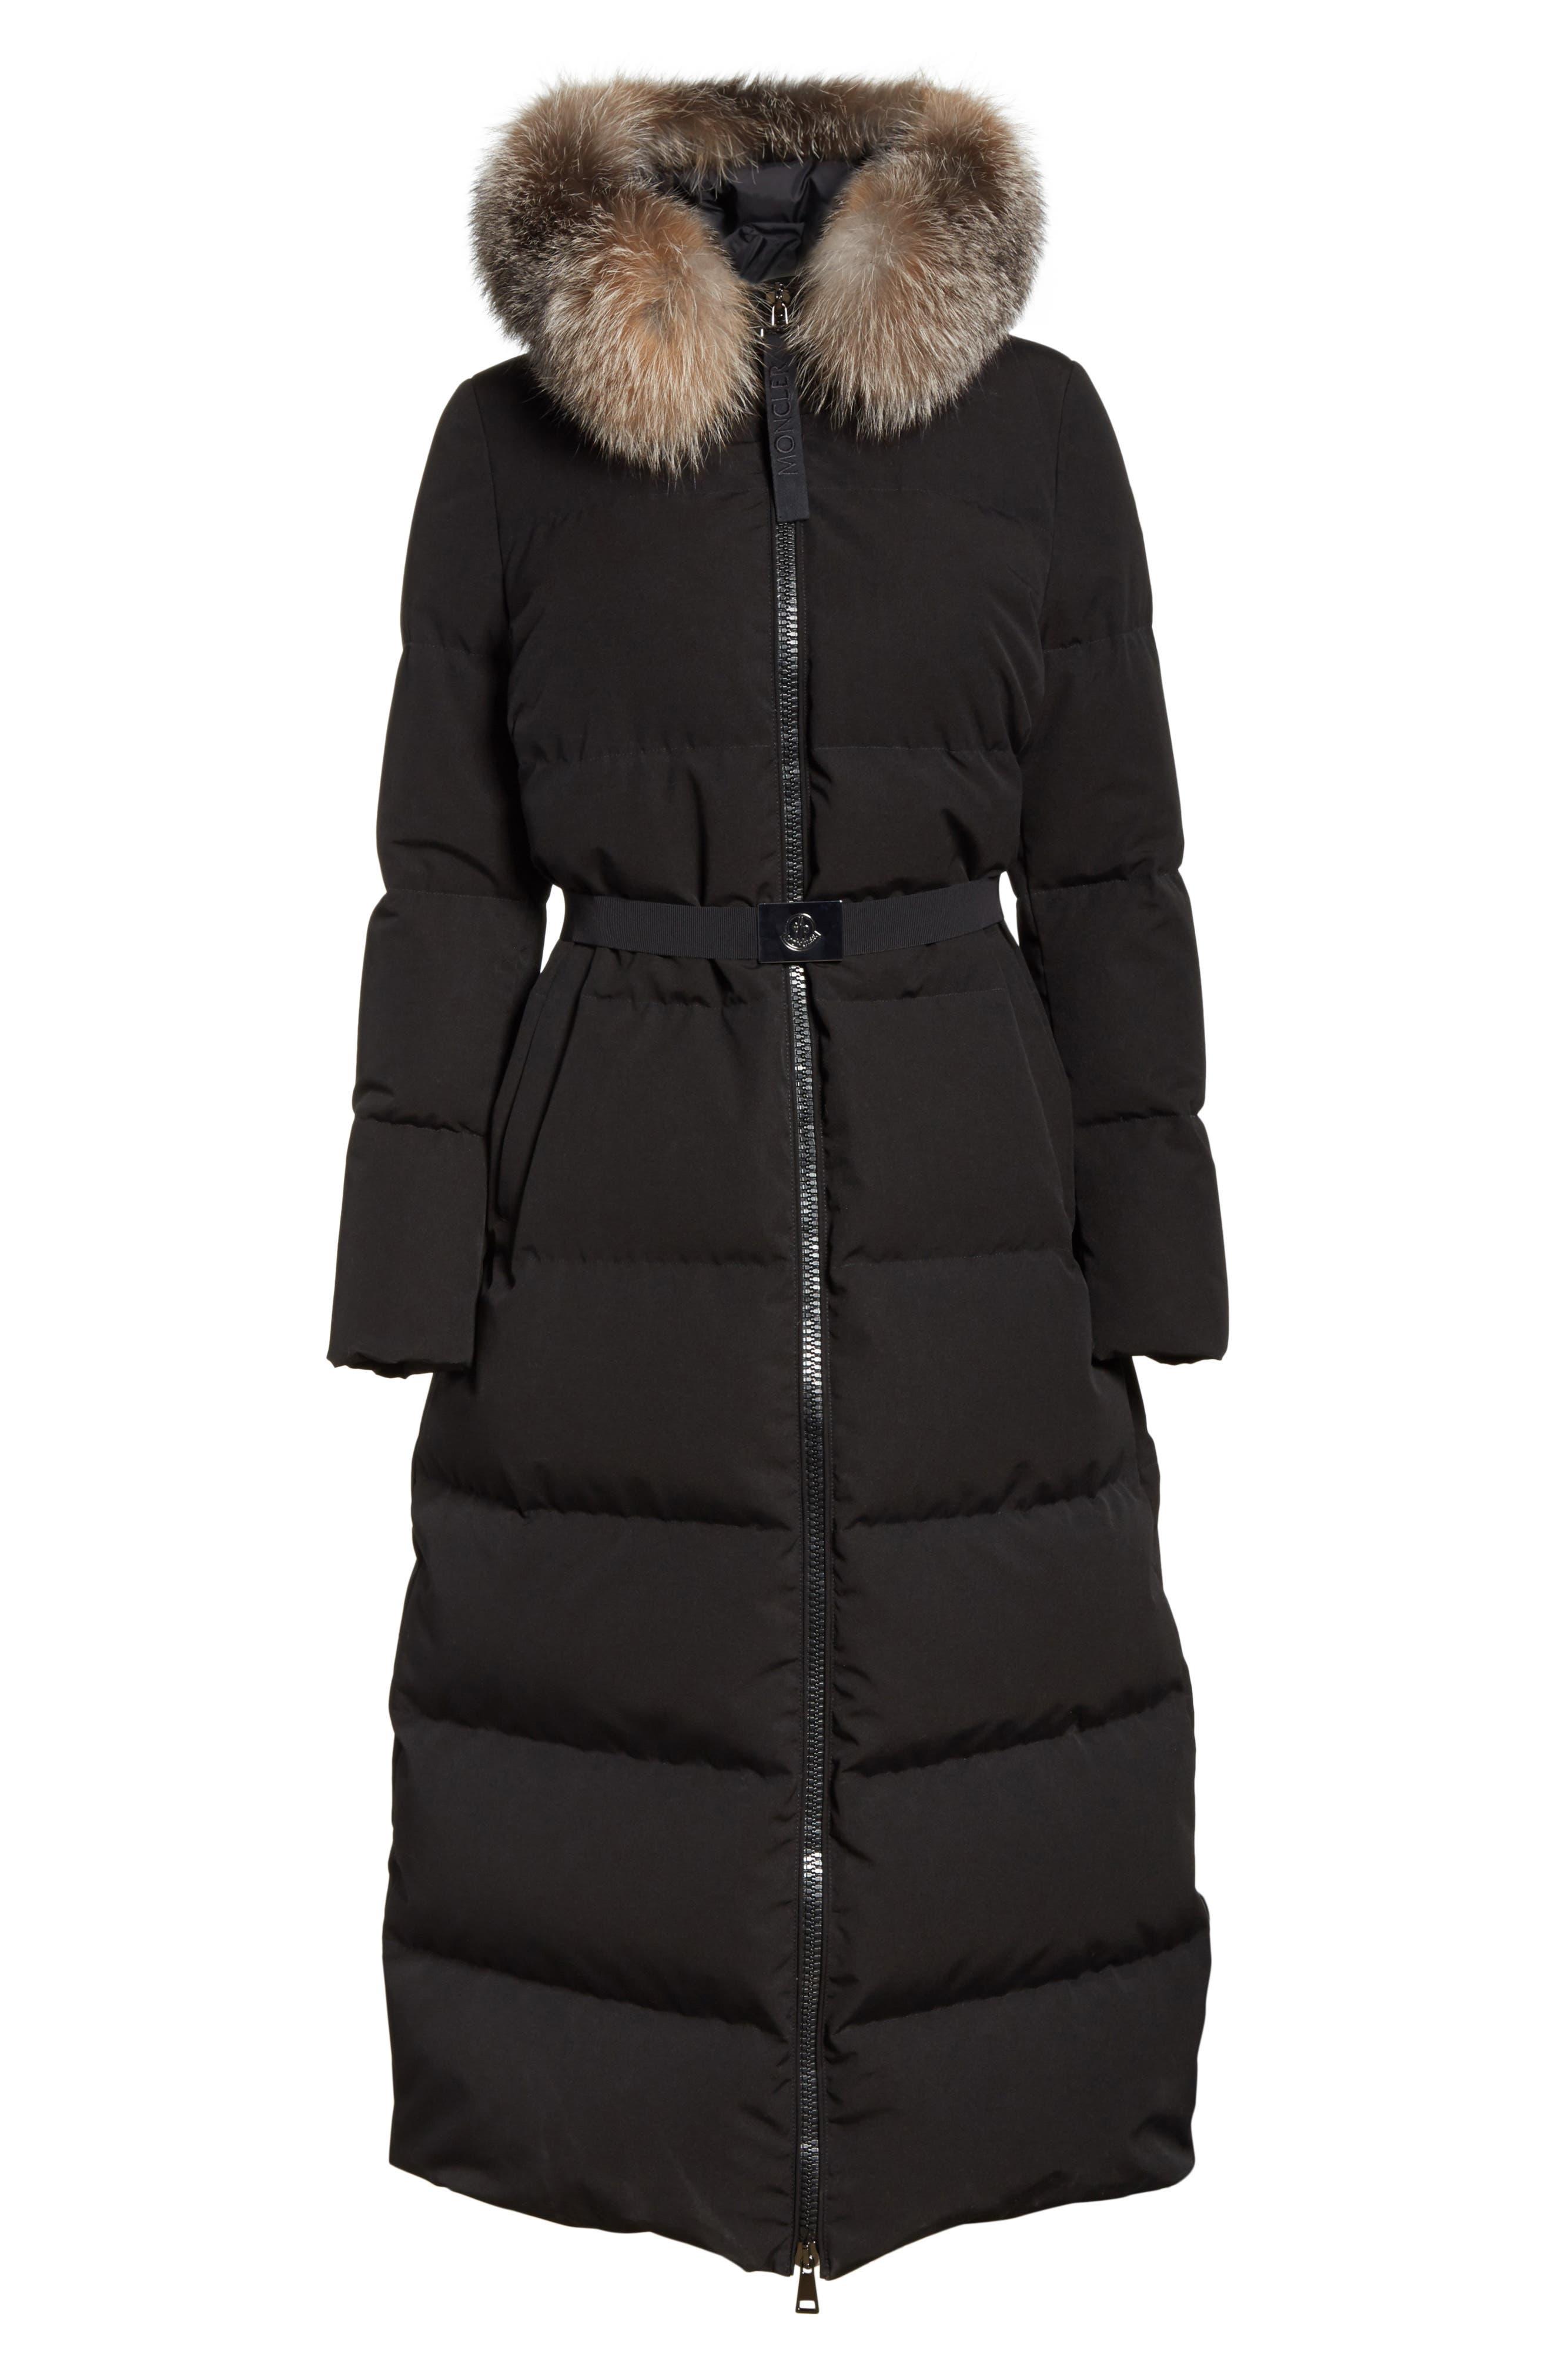 Bernache Hooded Down Coat with Removable Genuine Fox Fur Trim,                             Alternate thumbnail 5, color,                             BLACK